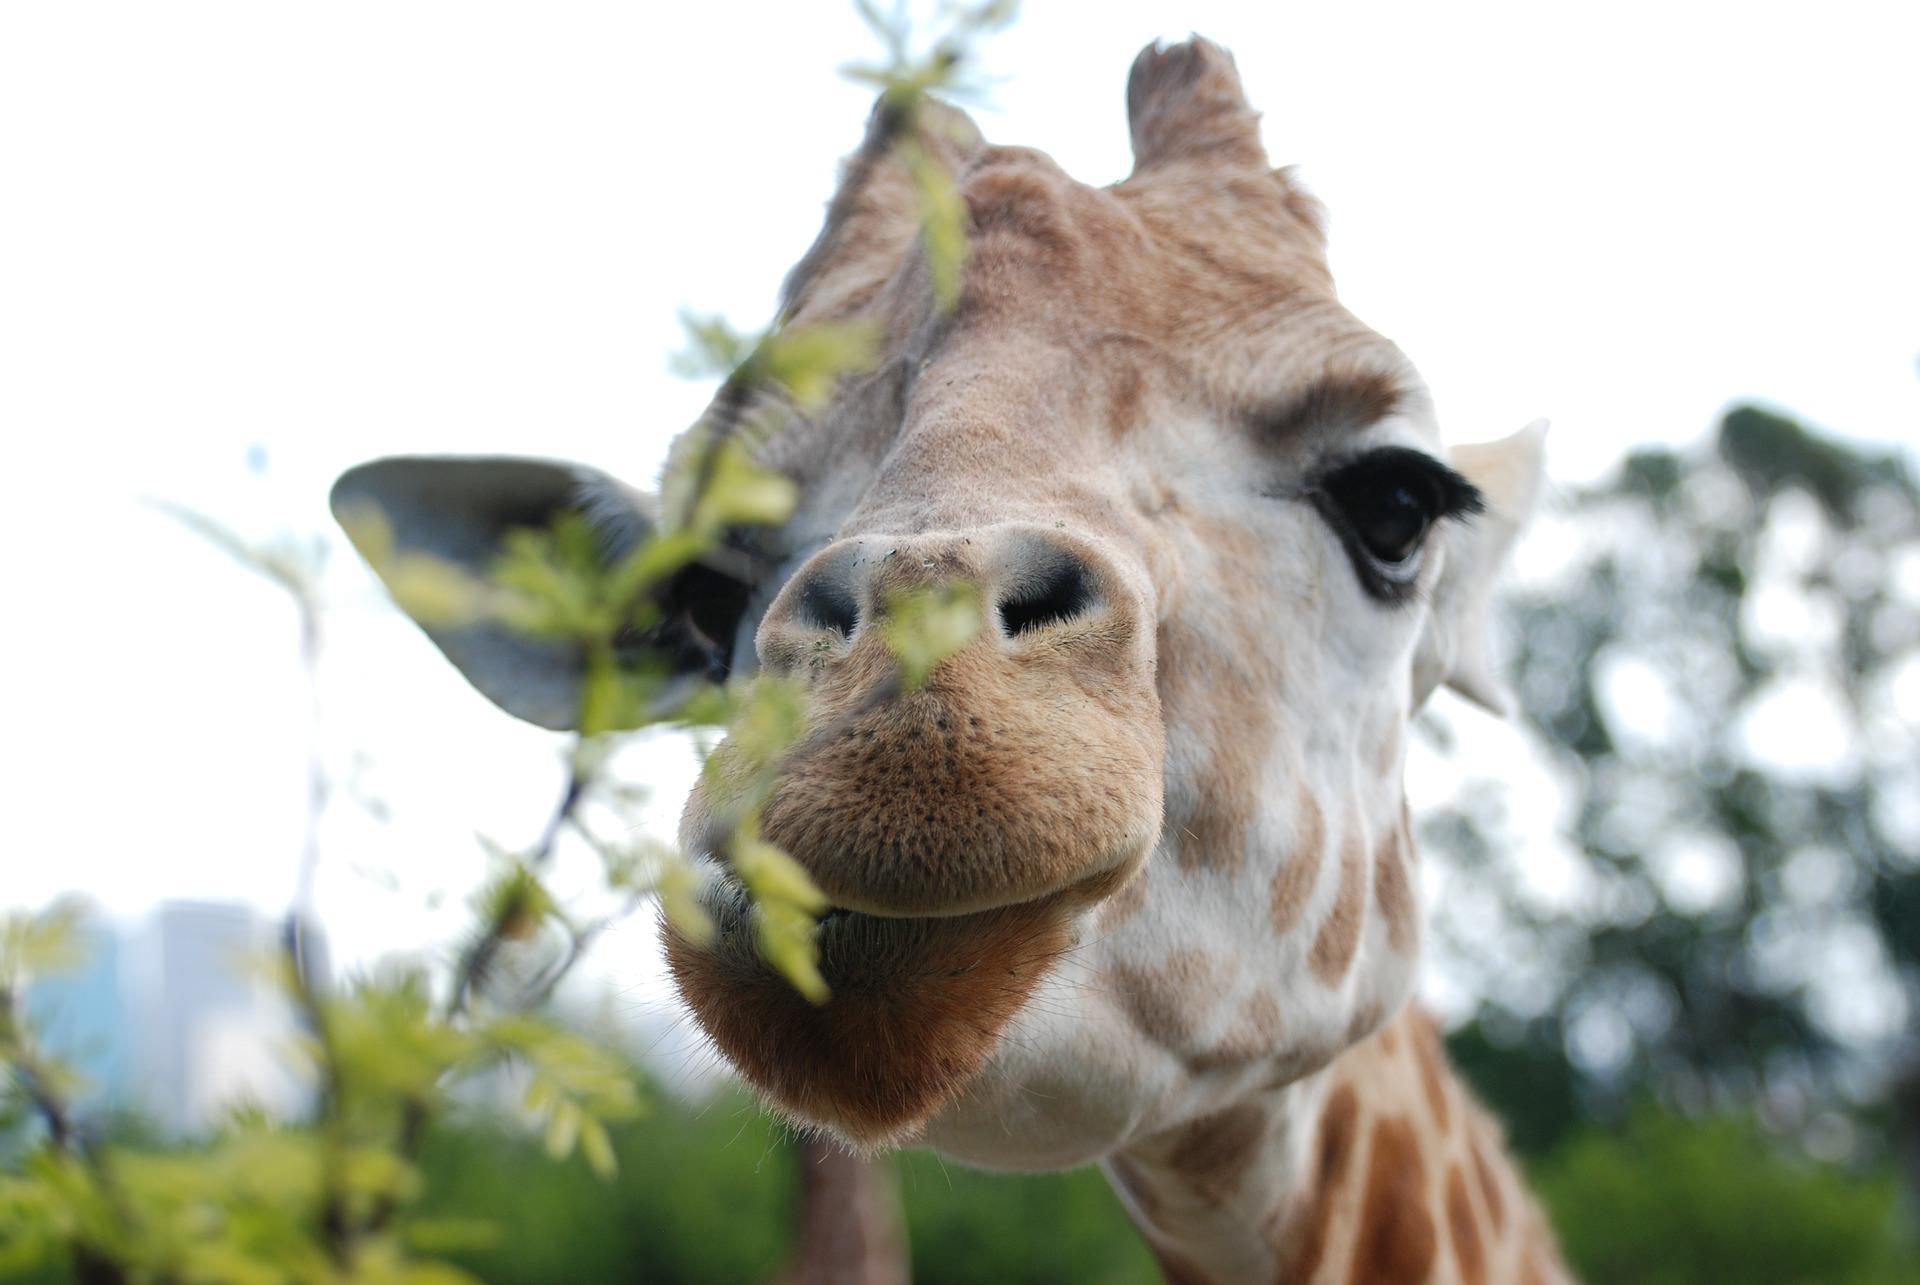 giraffe animal funny face hd wallpaper background 2287